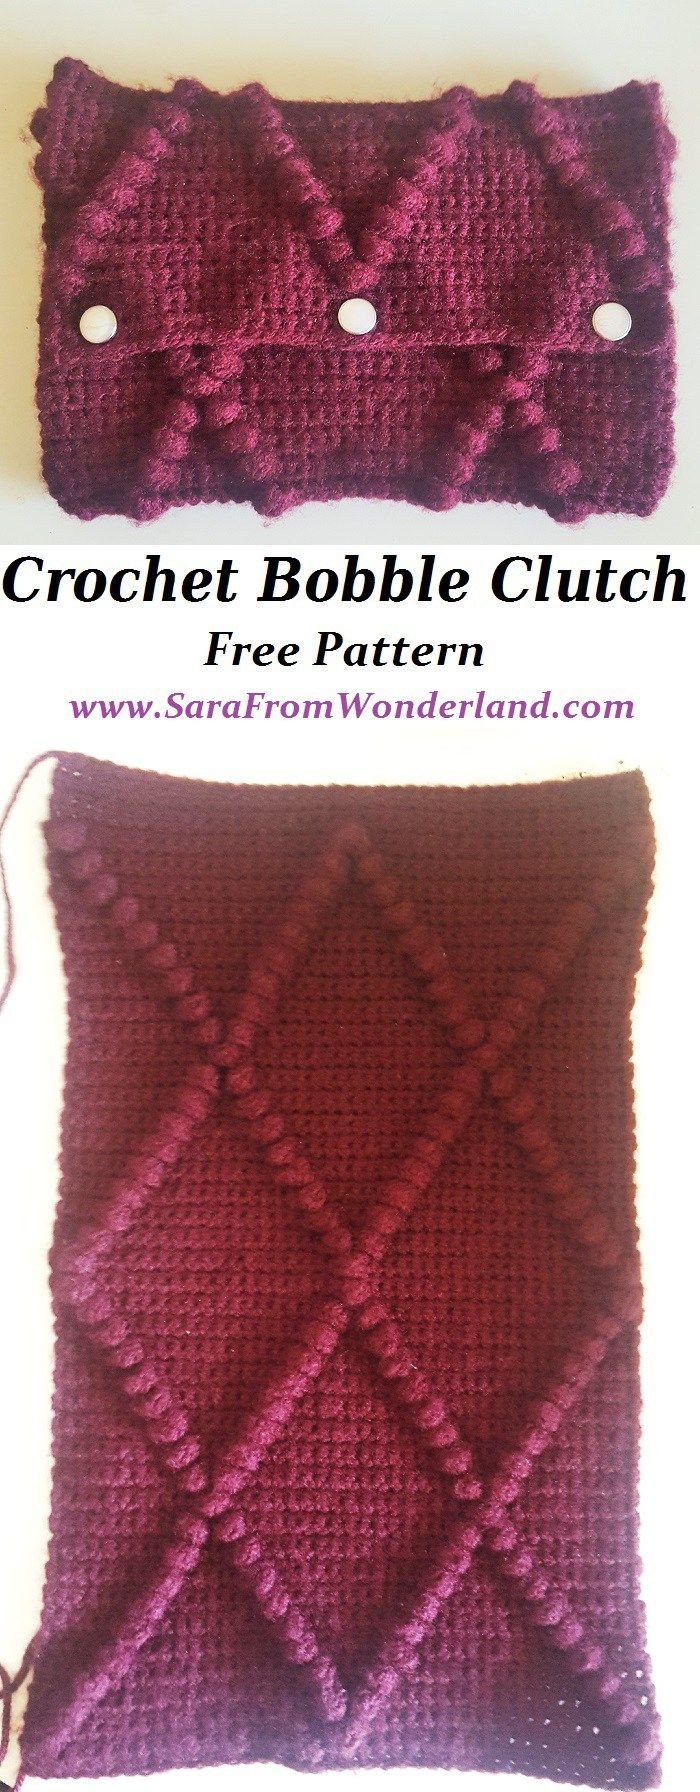 Ganchillo Bobble embrague - SaraFromWonderland | carteras crochet ...